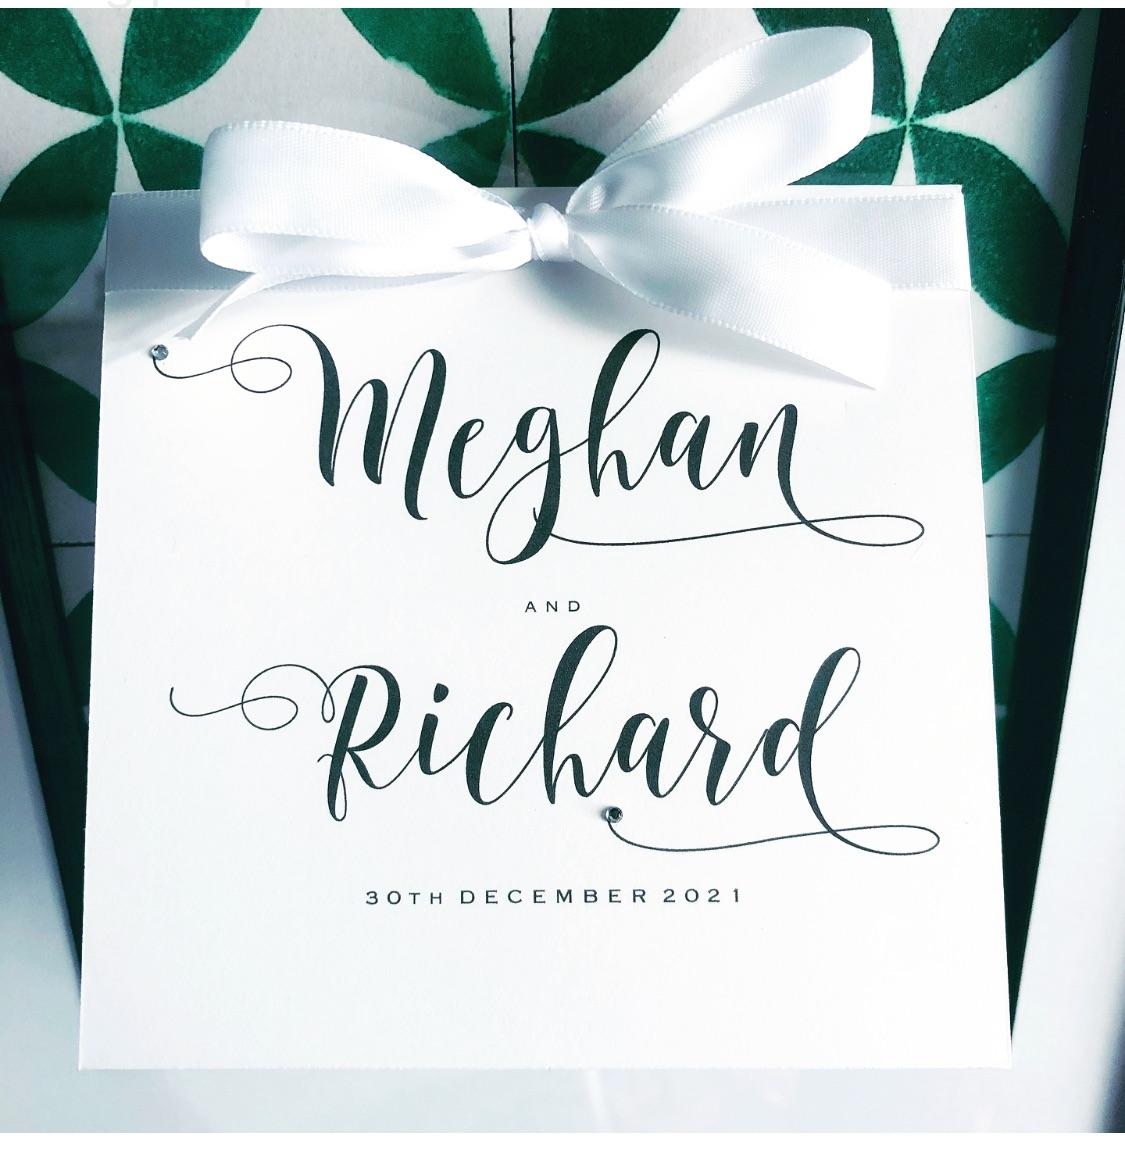 White wedding invitations with beautiful swirly fonts